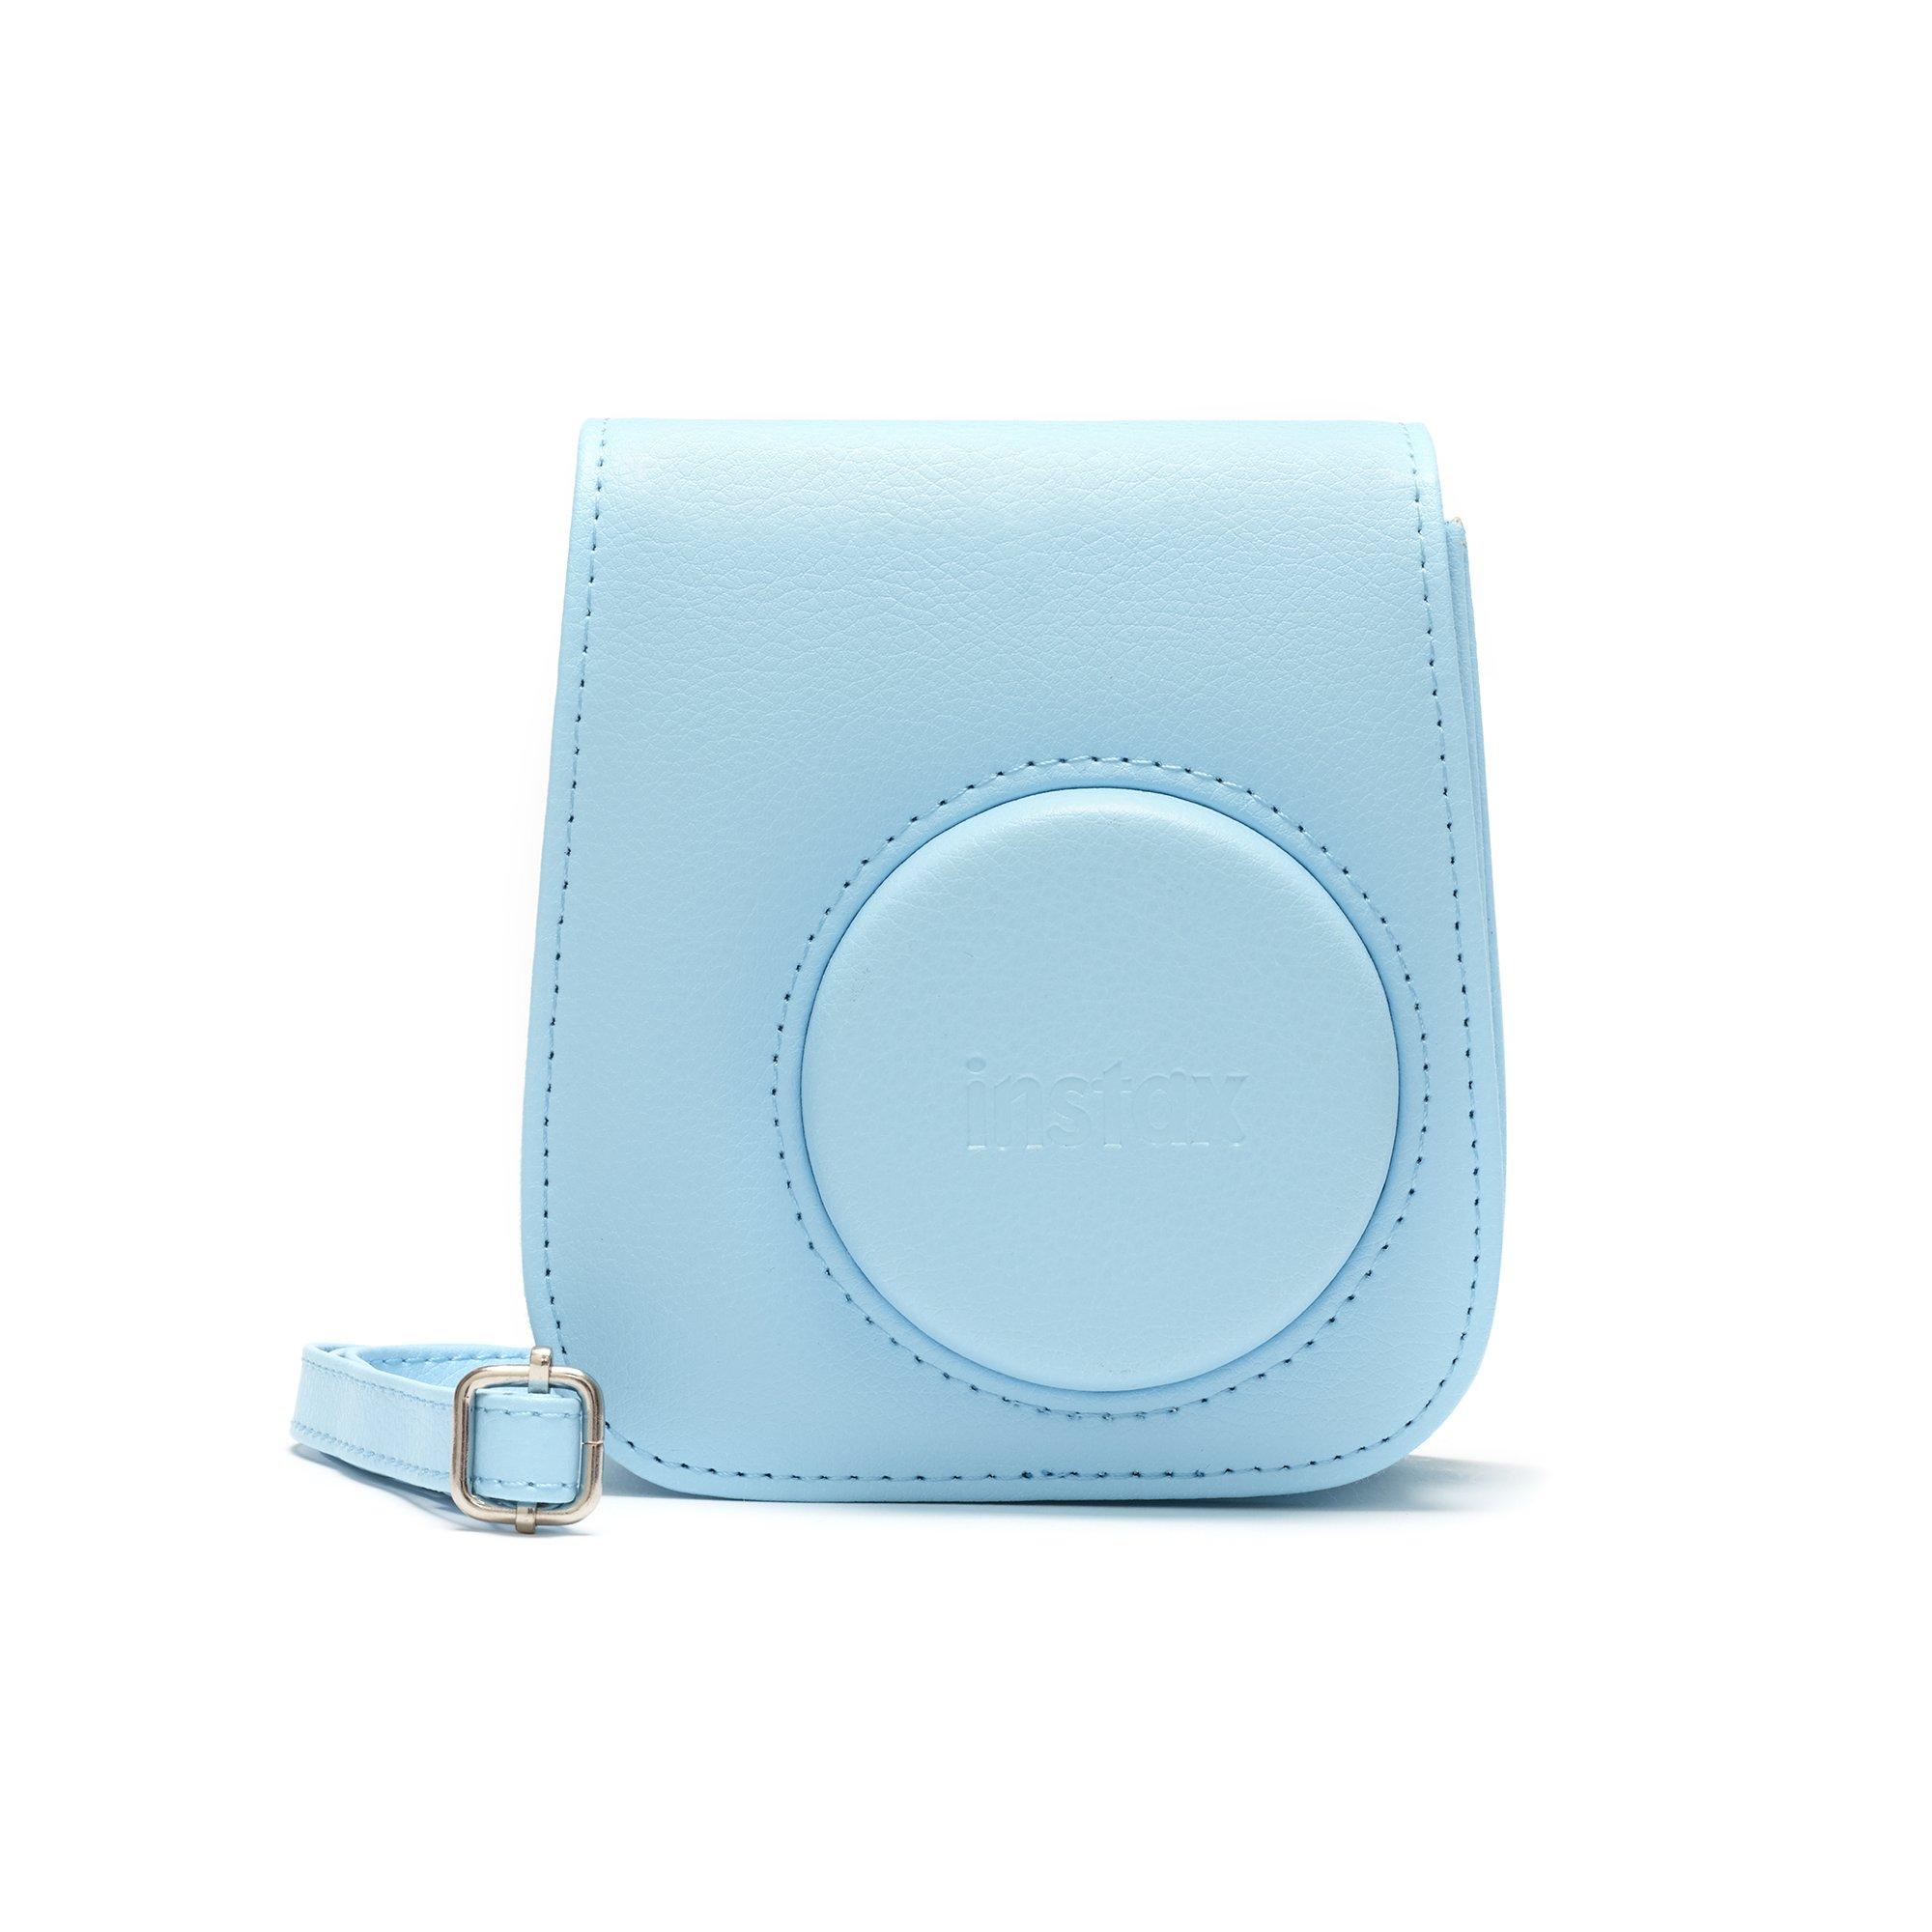 Accessoire kit instax mini 11 - Sky Blue